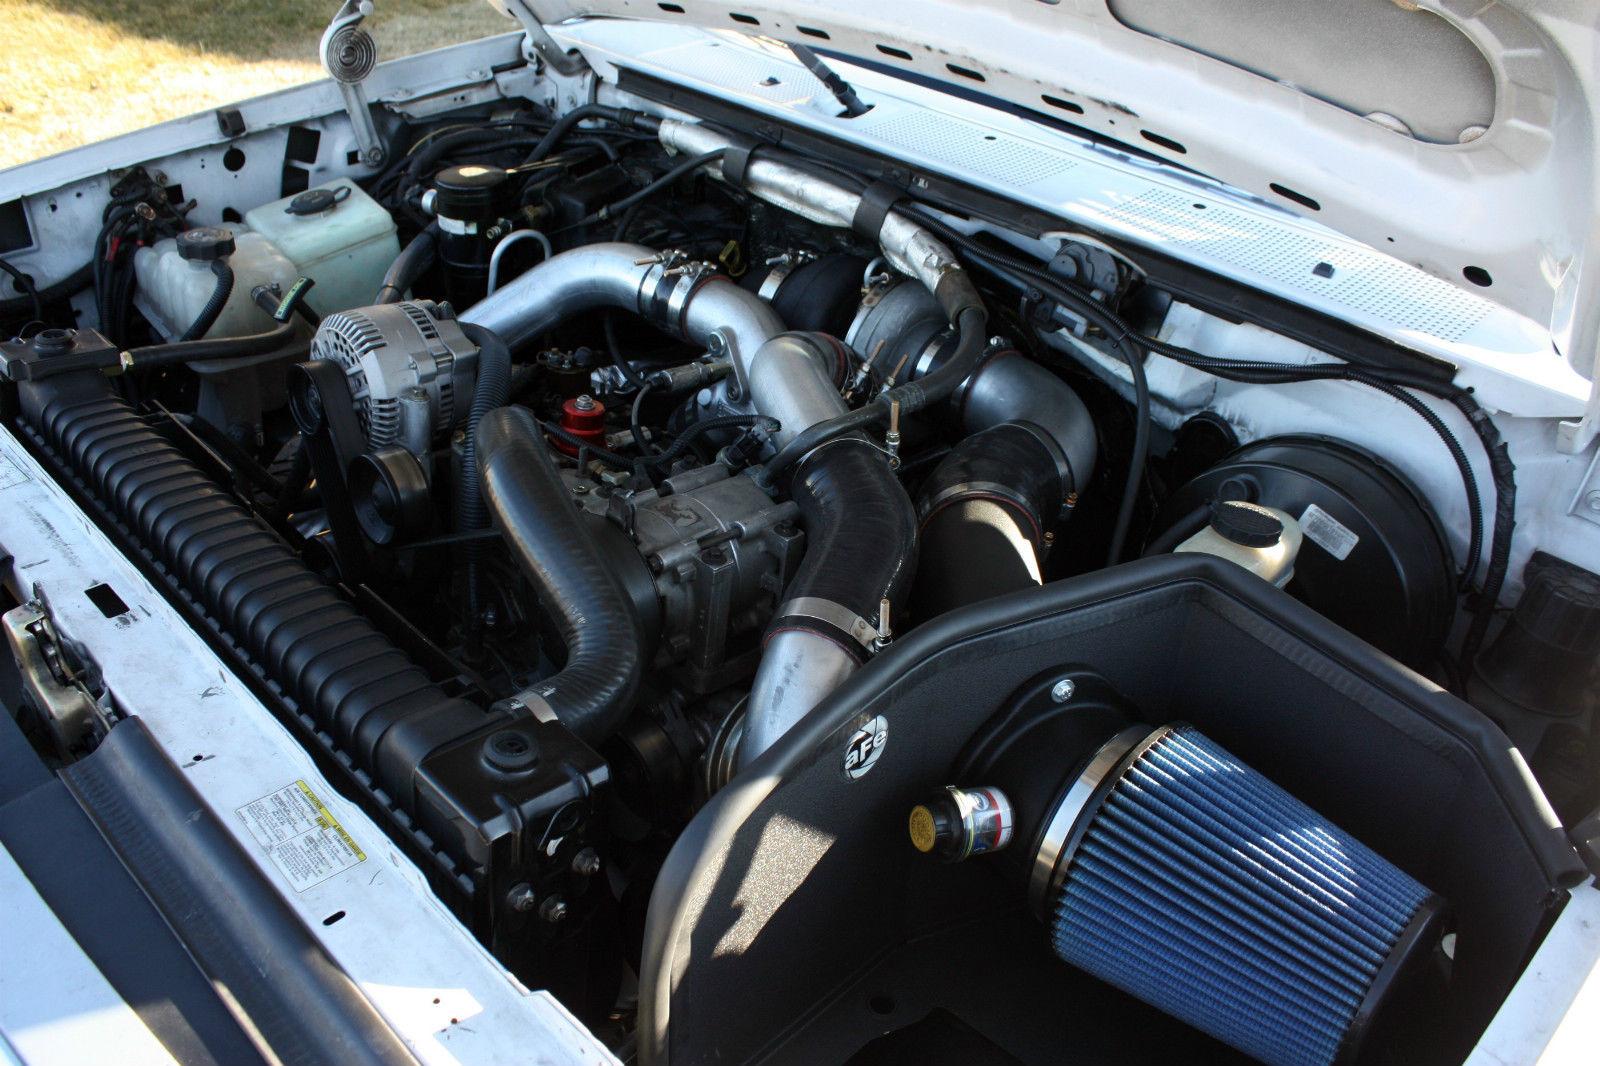 This Triple Turbo 7 3 Powerstroke Has The Loudest Turbo